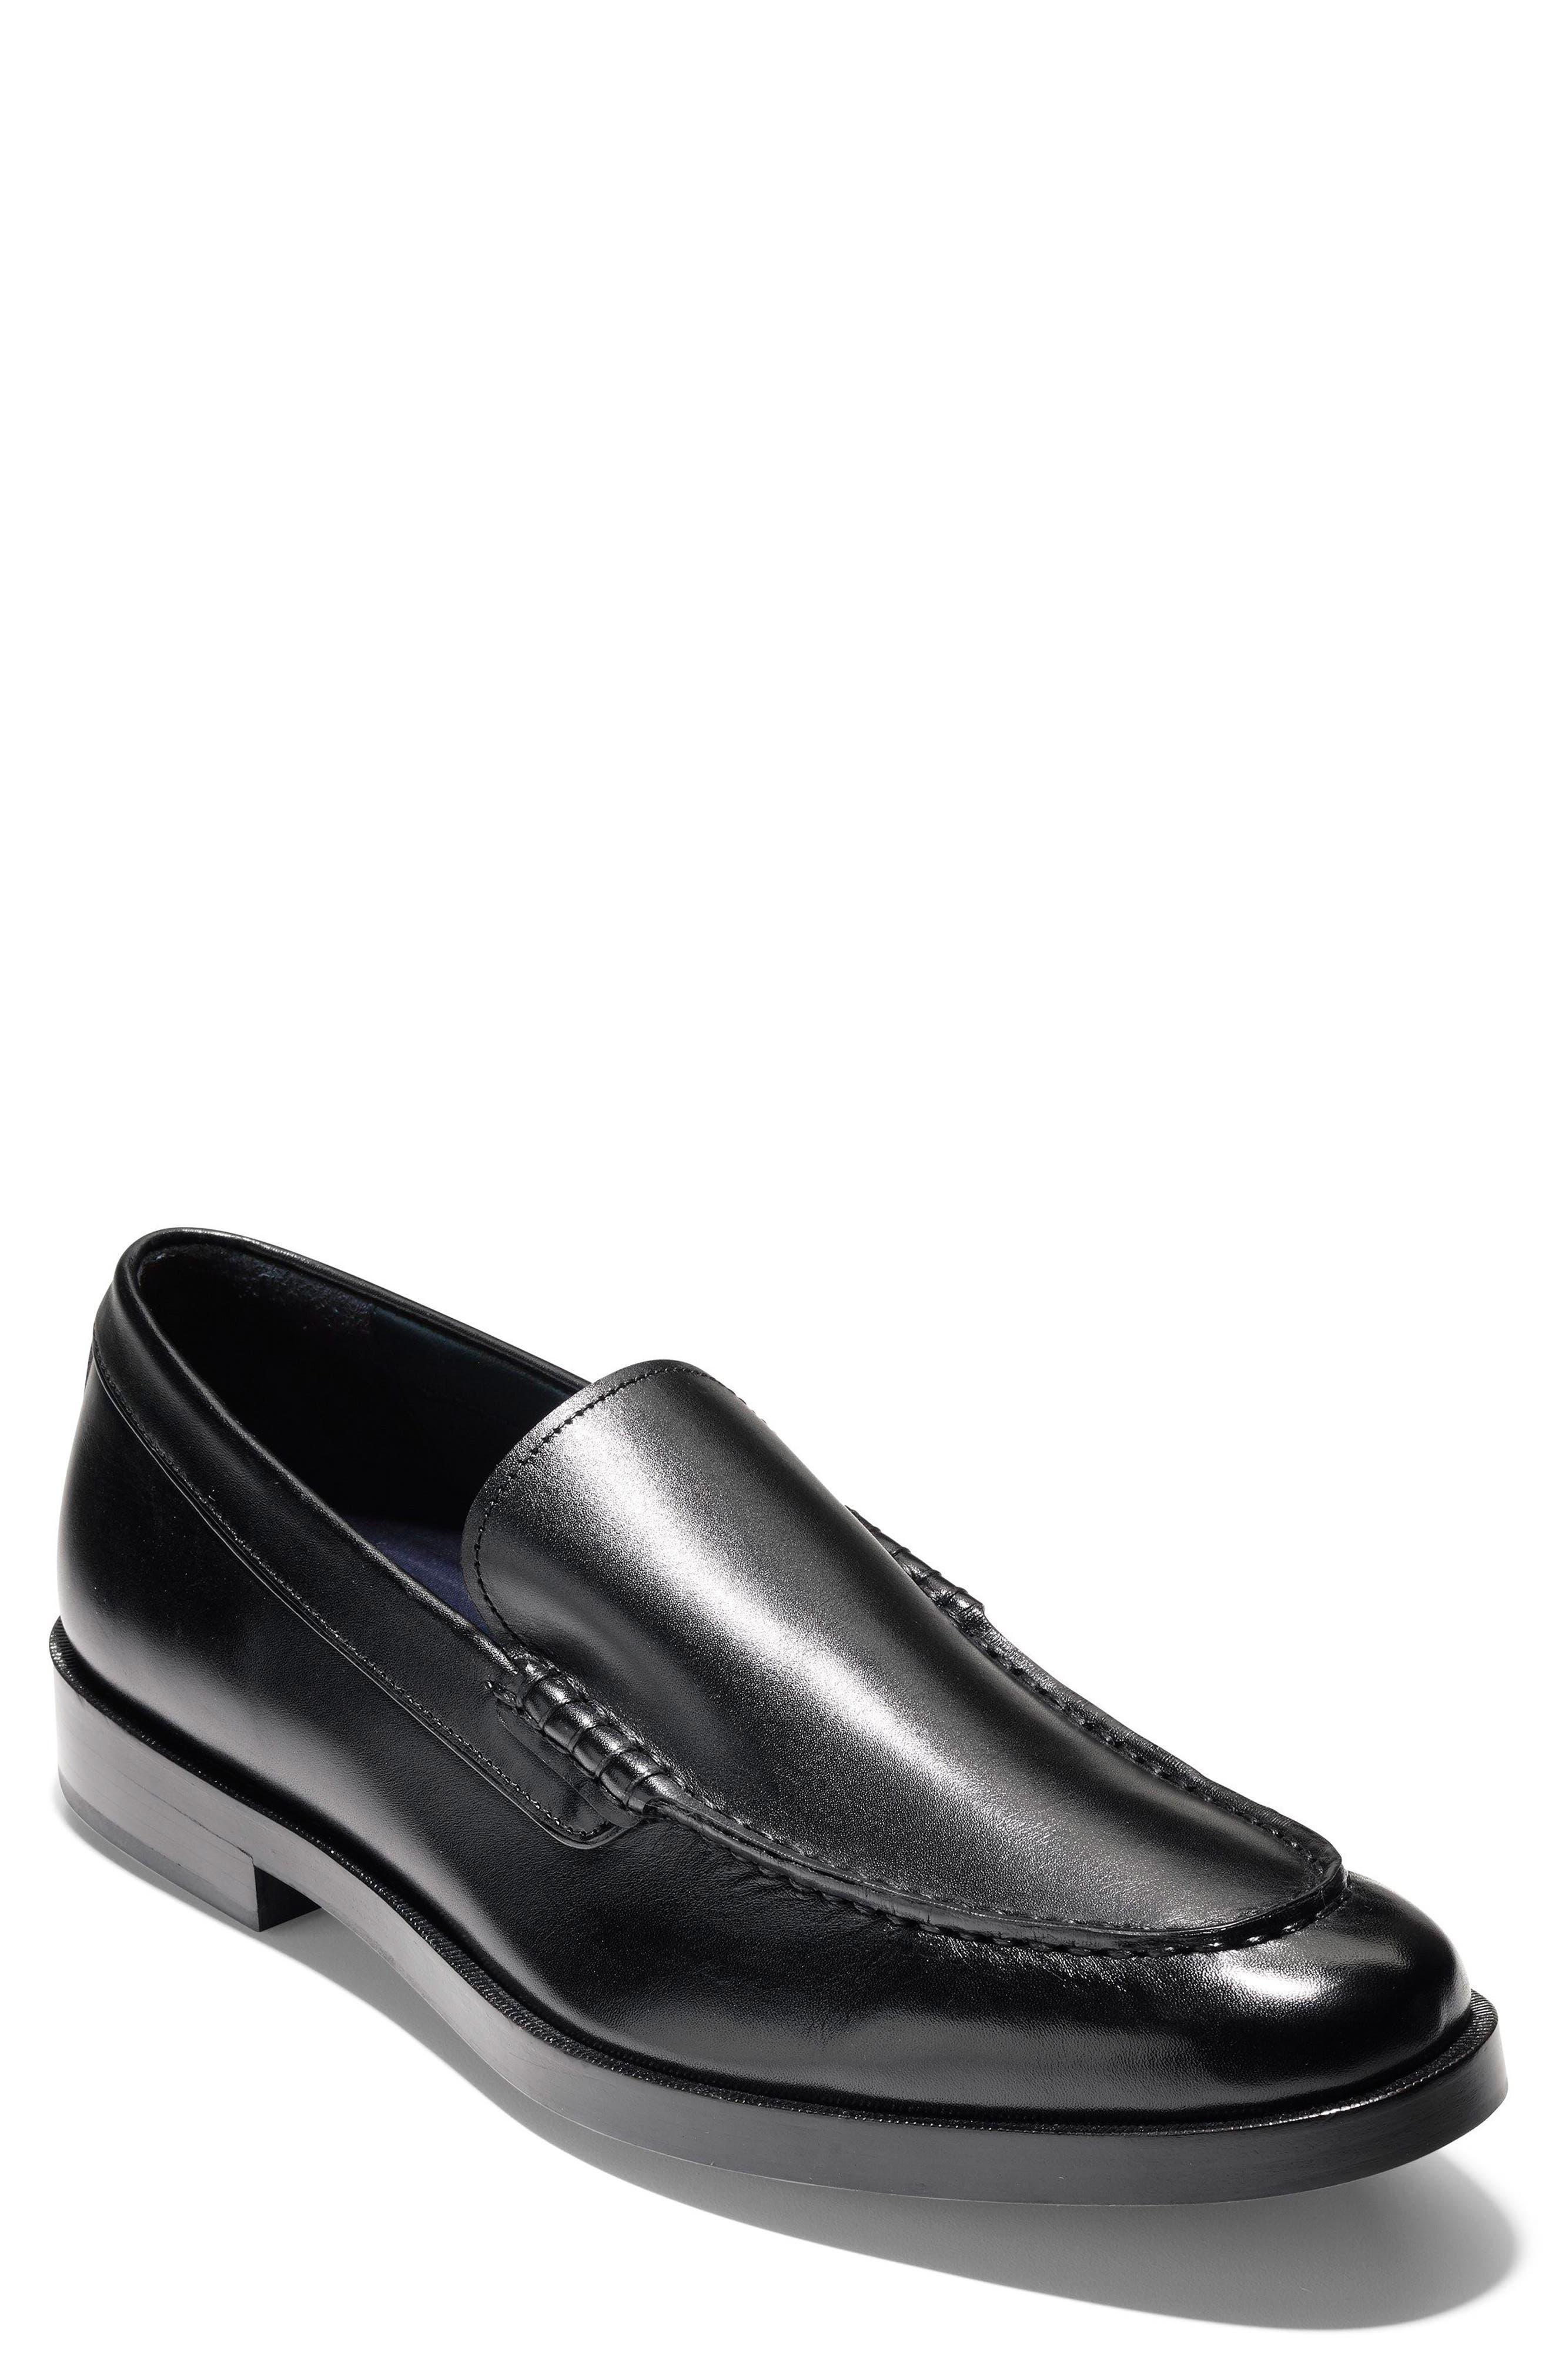 Hamilton Grand Venetian Loafer,                         Main,                         color, Black